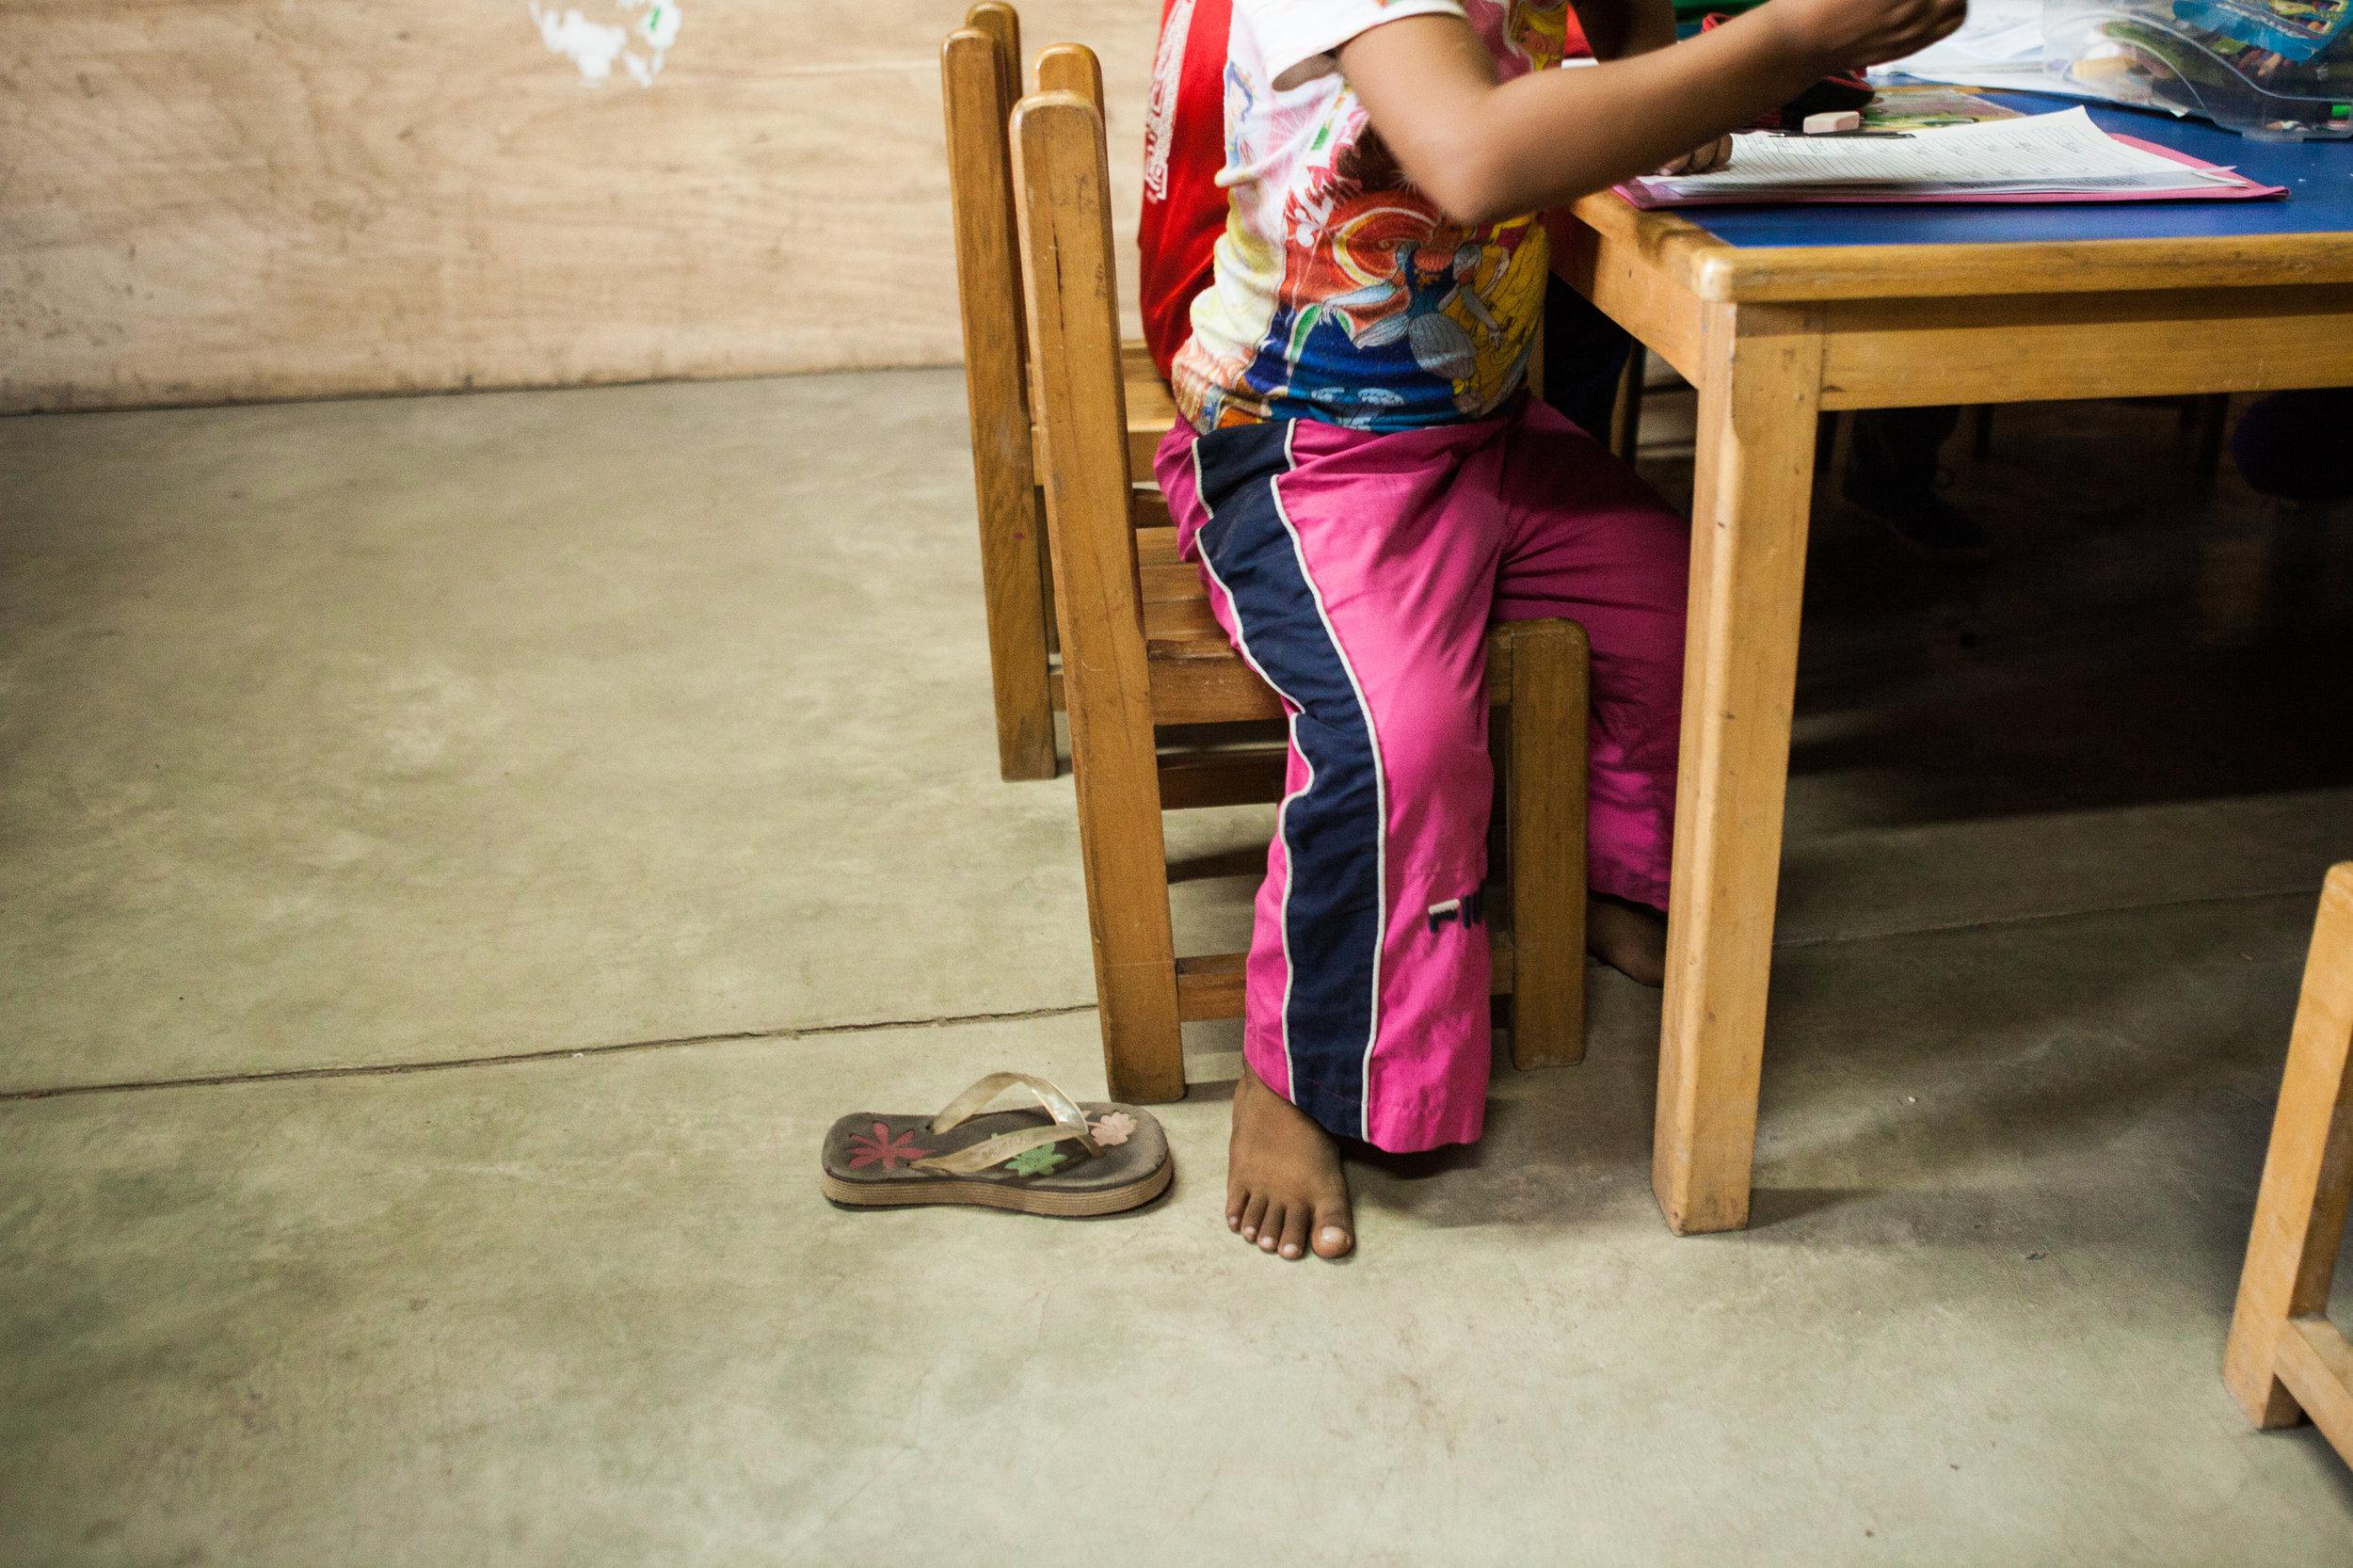 toronto-documentary-photographers-without-borders-3.jpg